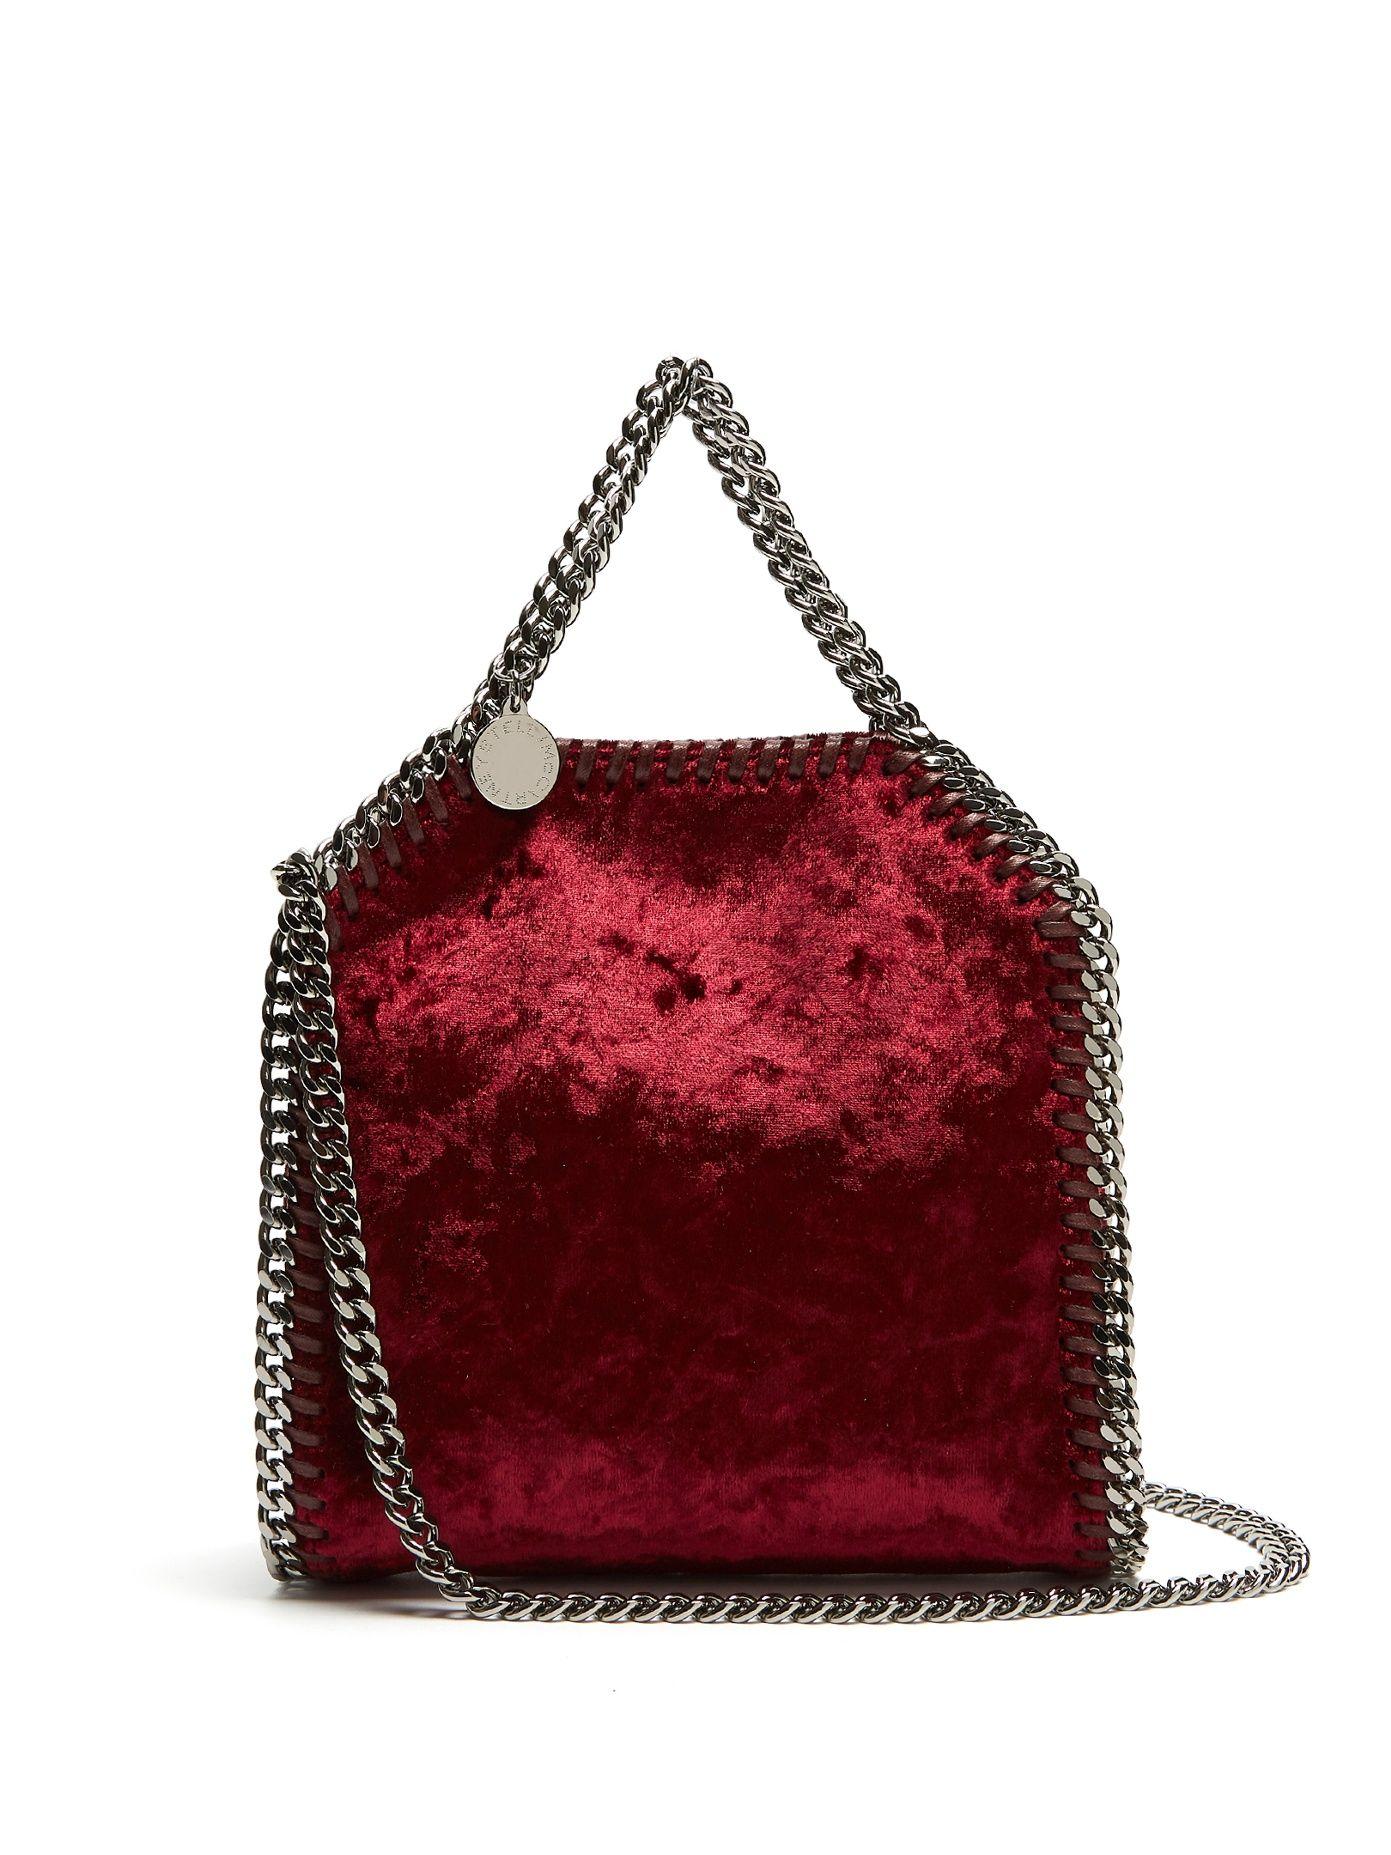 678ef0b8d65a STELLA MCCARTNEY Tiny Falabella velvet cross-body bag